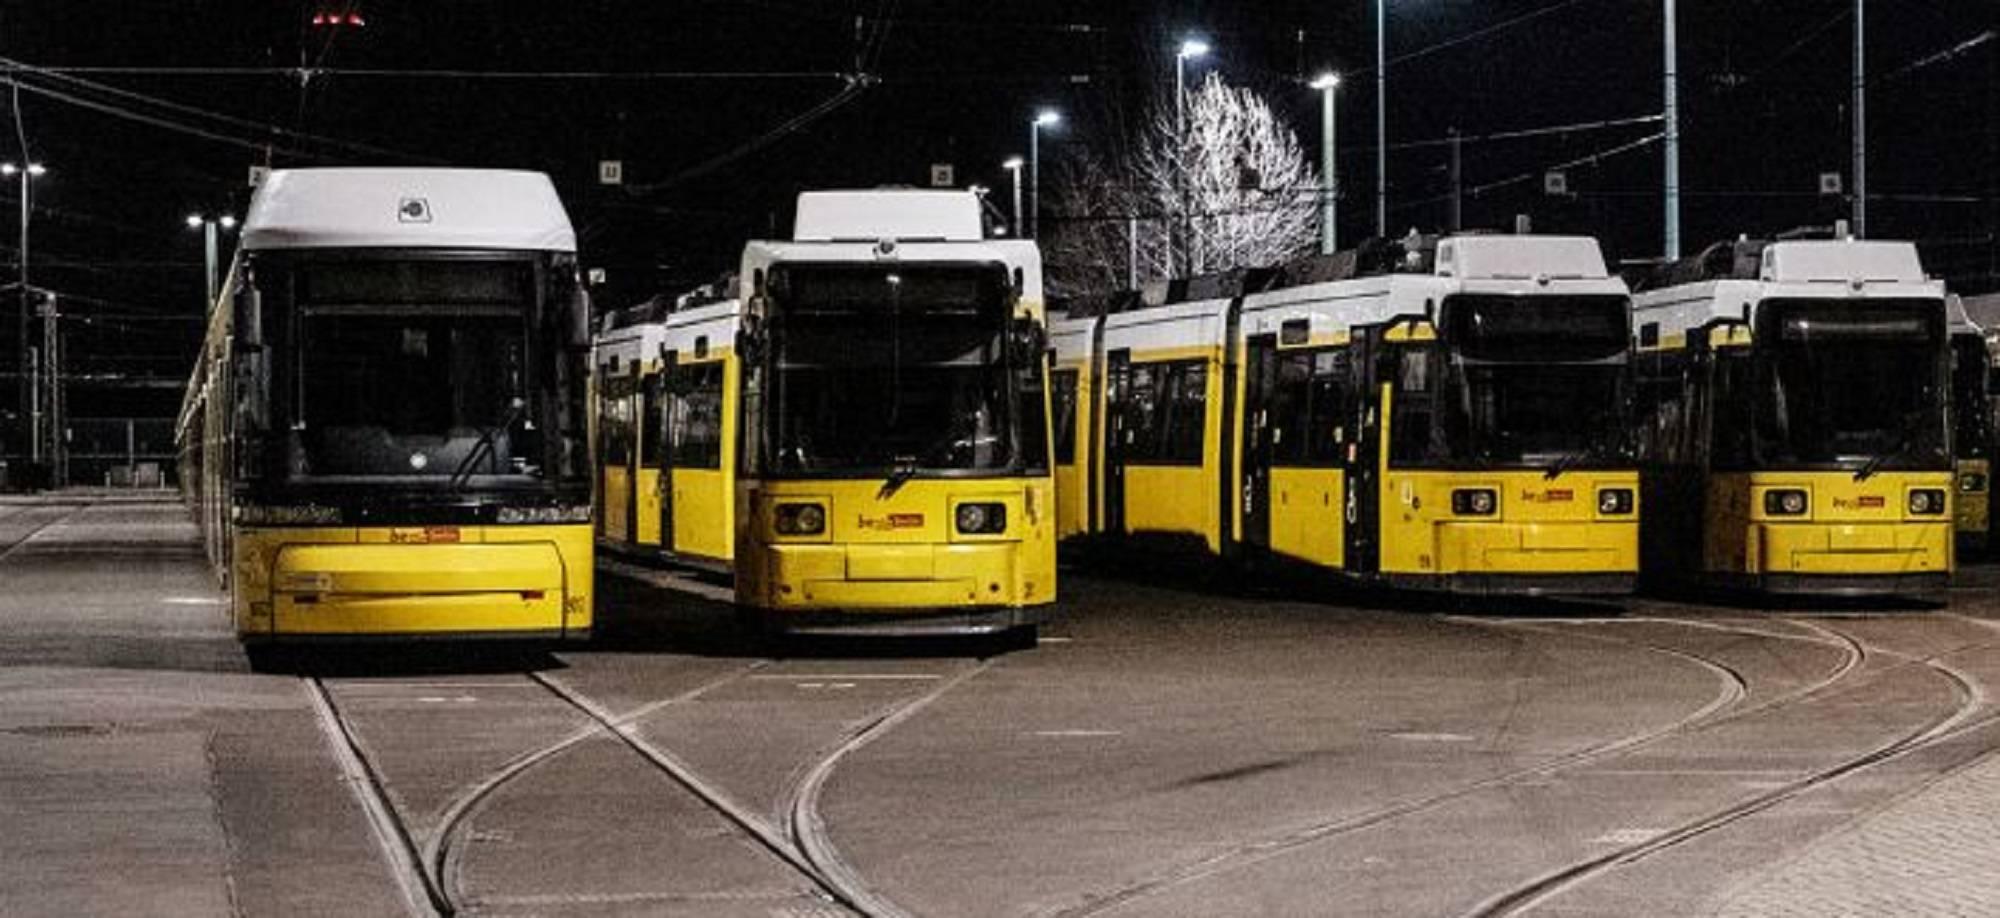 Транспорт германии